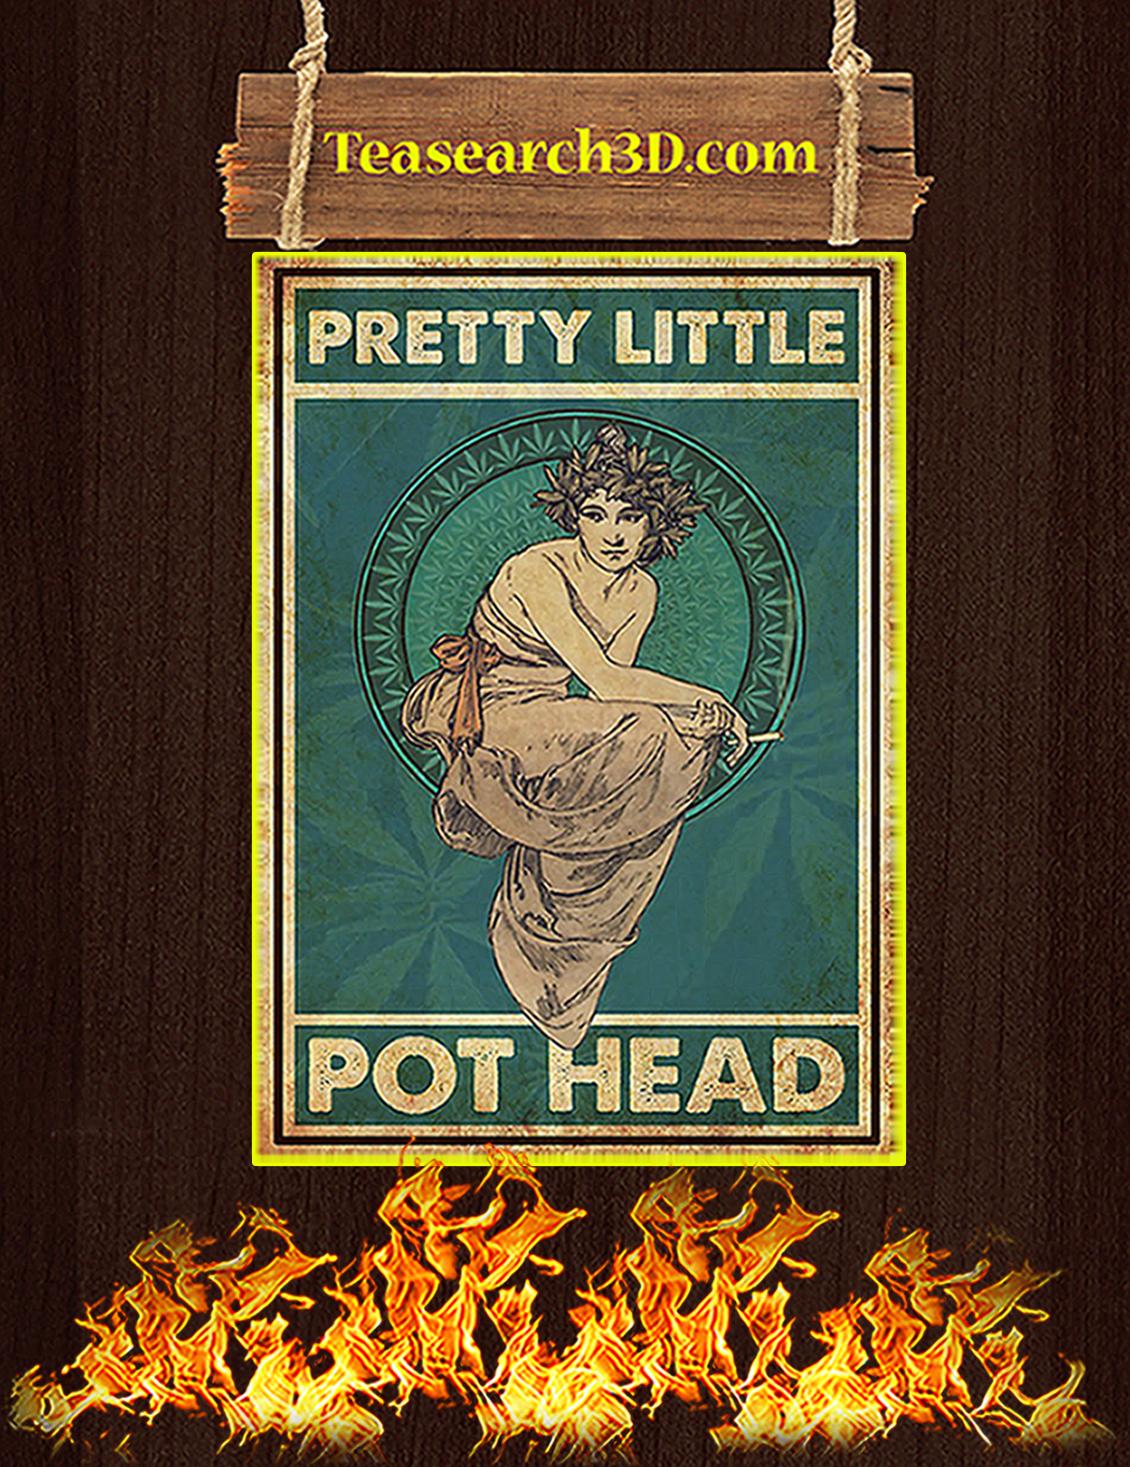 Pretty little pot head poster A3